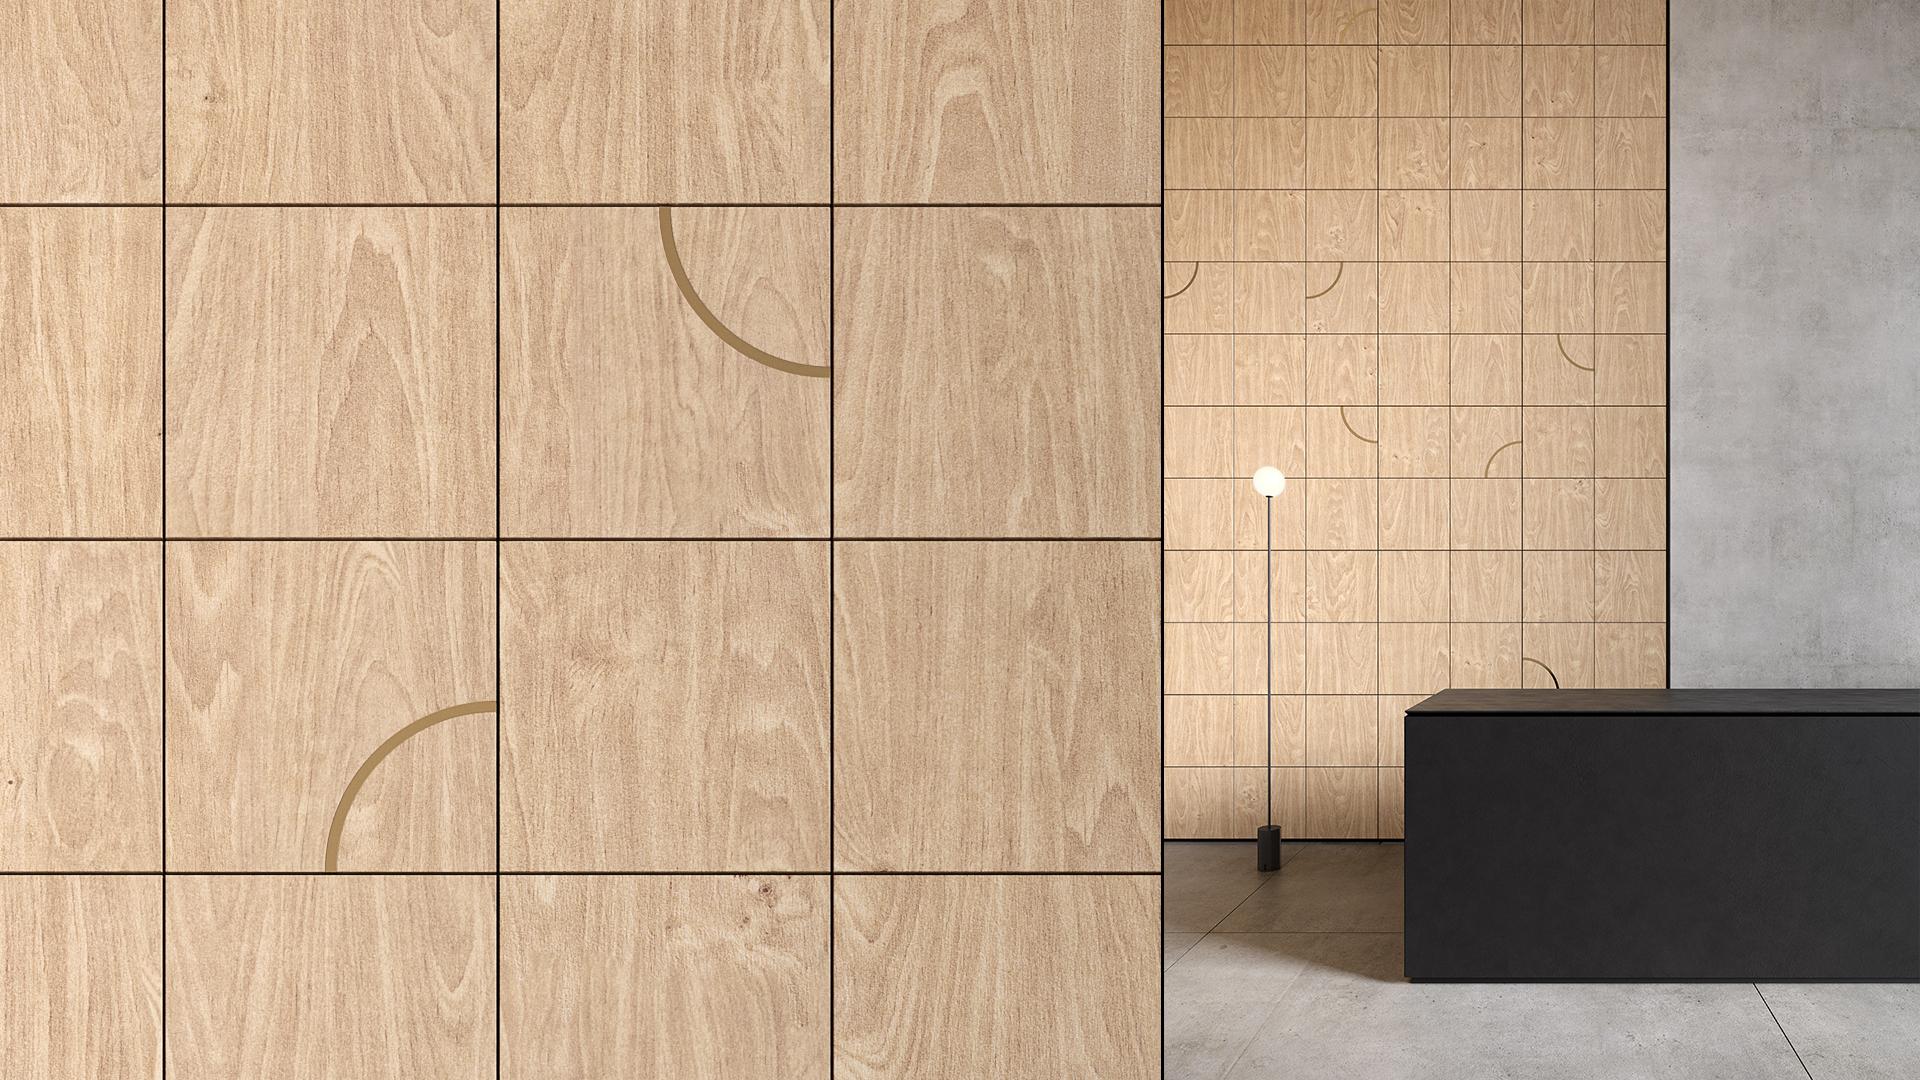 Maayan-Golan_Architectural-Visualization_product-visualization_wall-tiles_circle-collection_studio-itai-bar-on_02